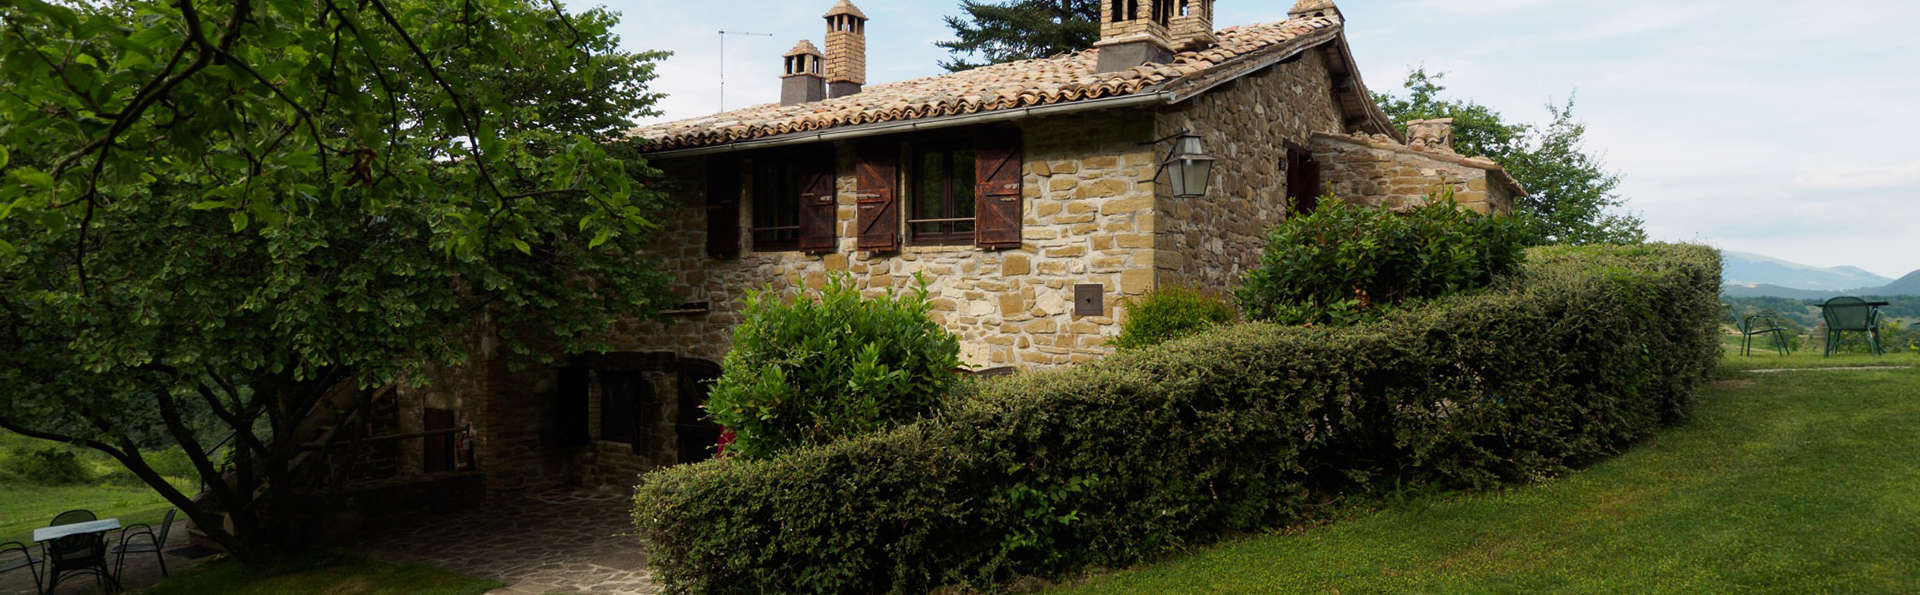 Le Silve di Armenzano - Residenza d'Epoca - Edit_Front.jpg